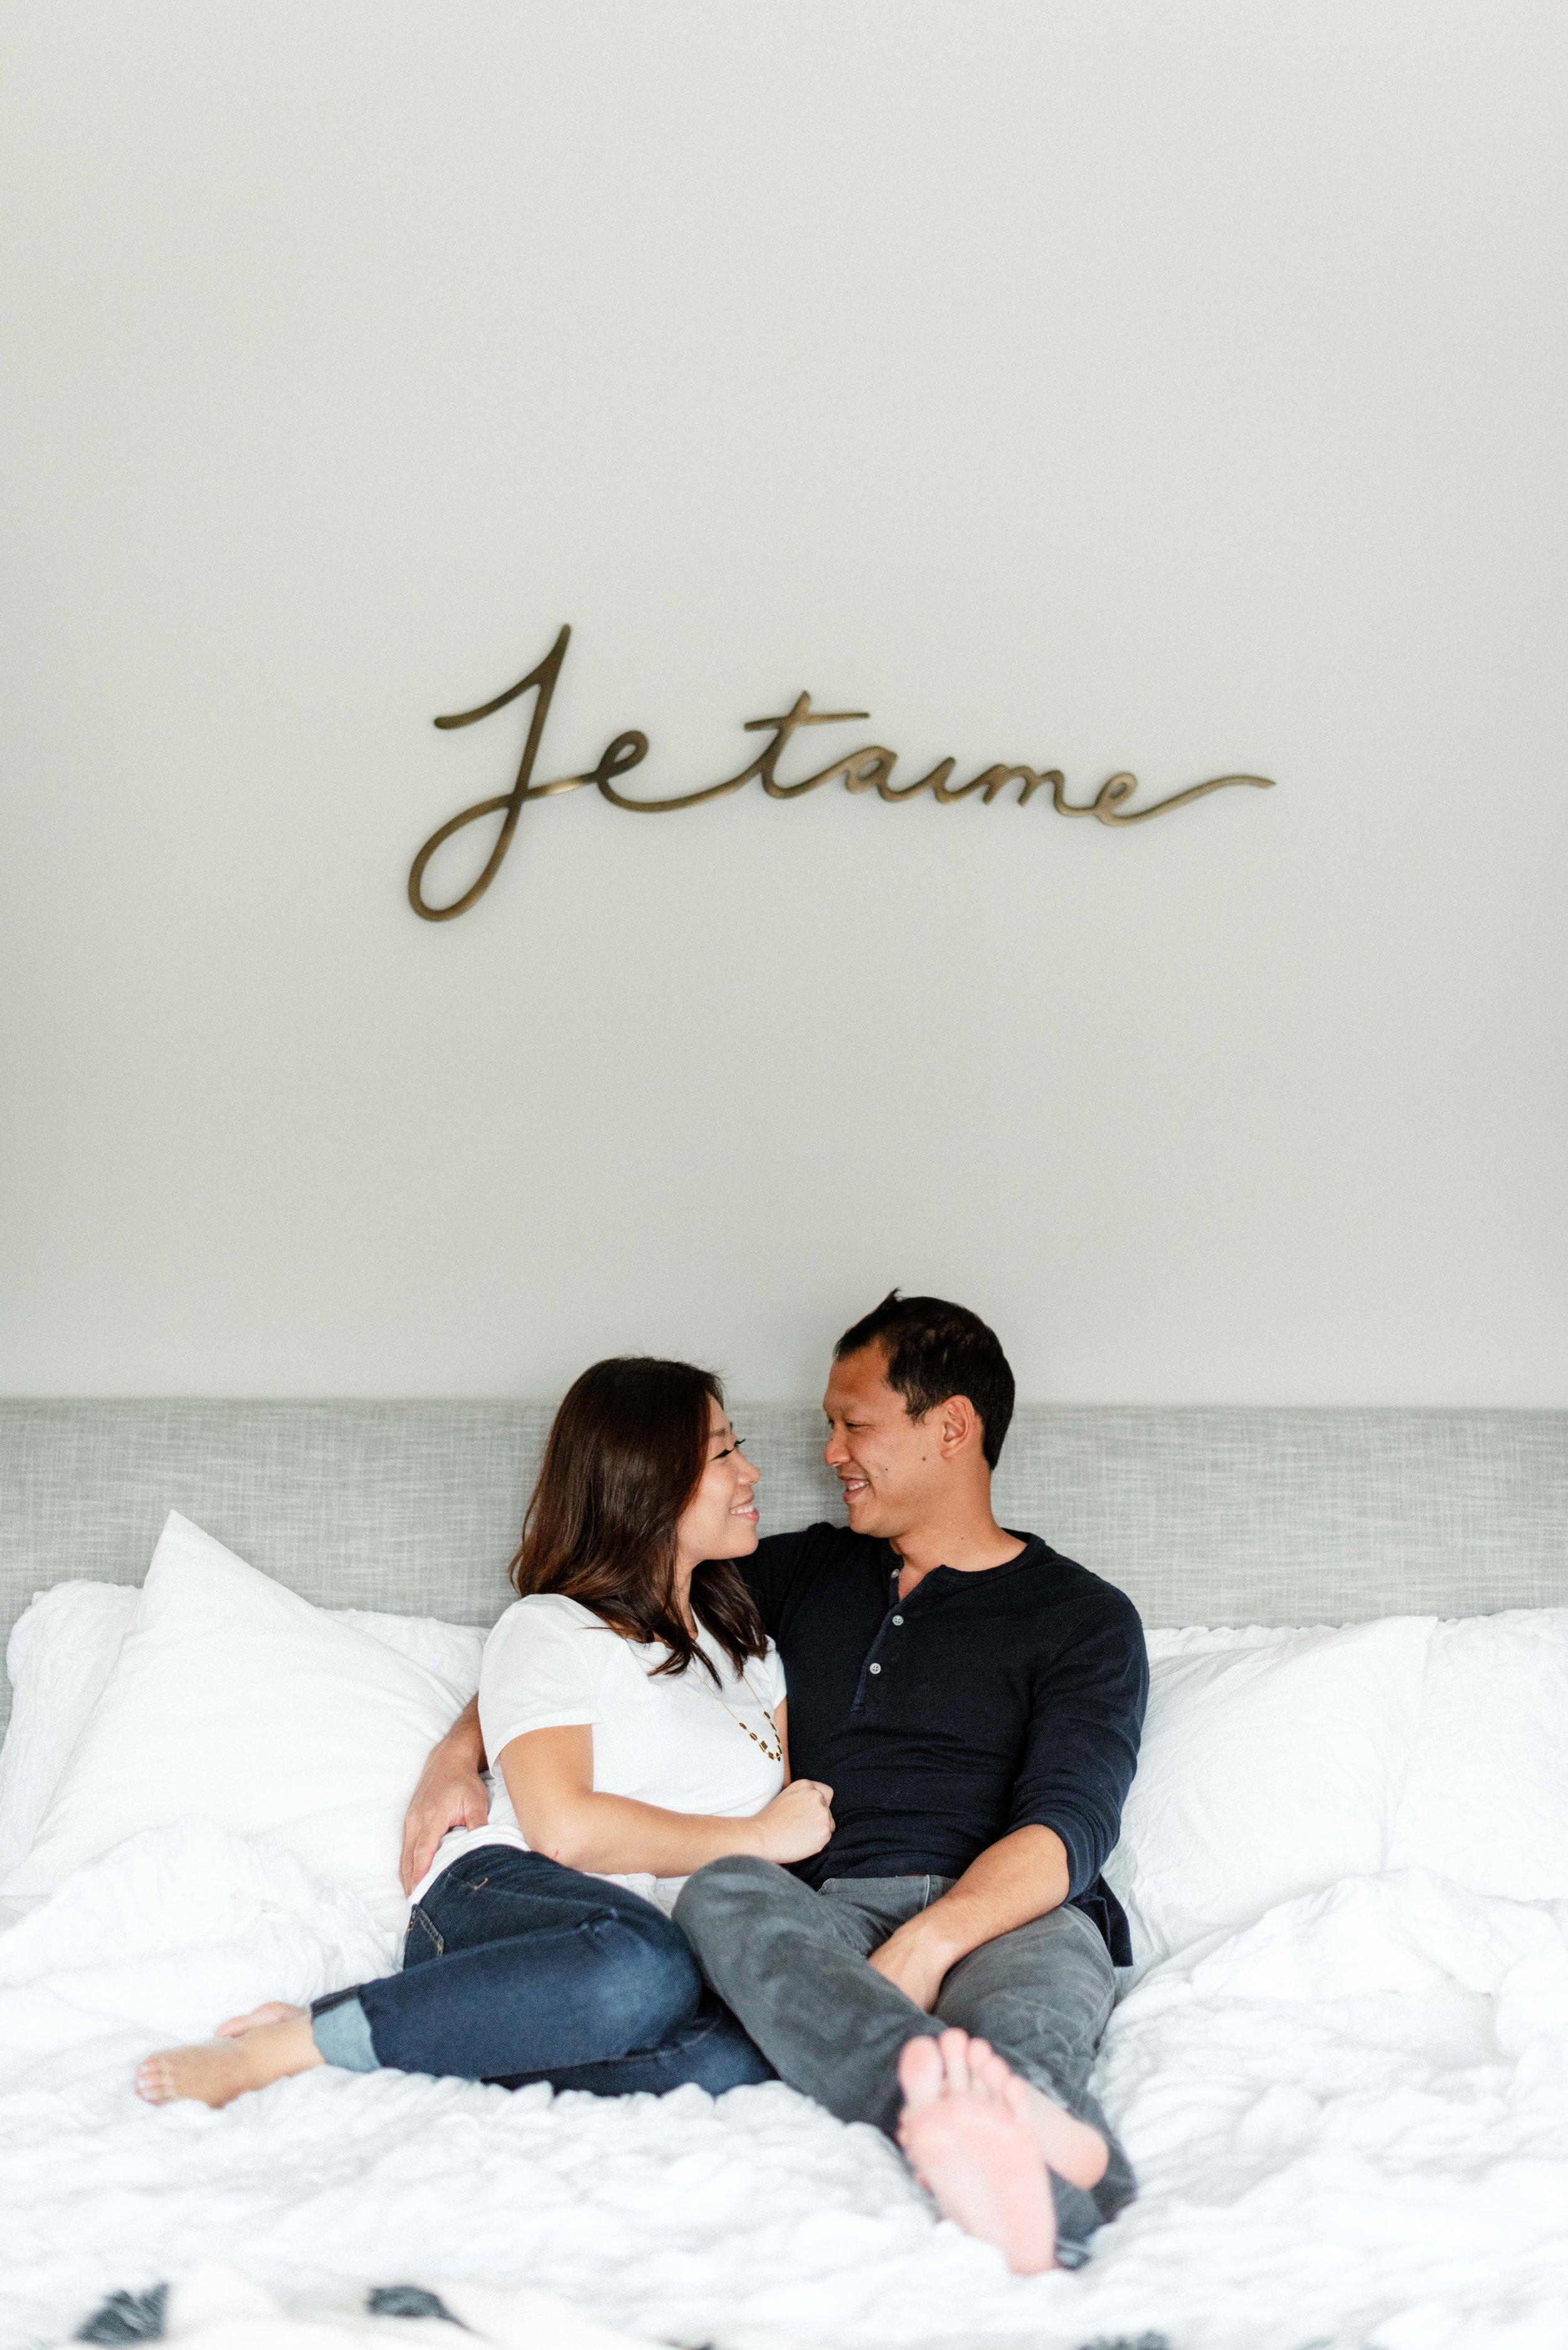 Houston-Wedding-Photographer-Best-Top-Luxury-Destination-Engagements-Portrait-Austin-Photography-14.jpg